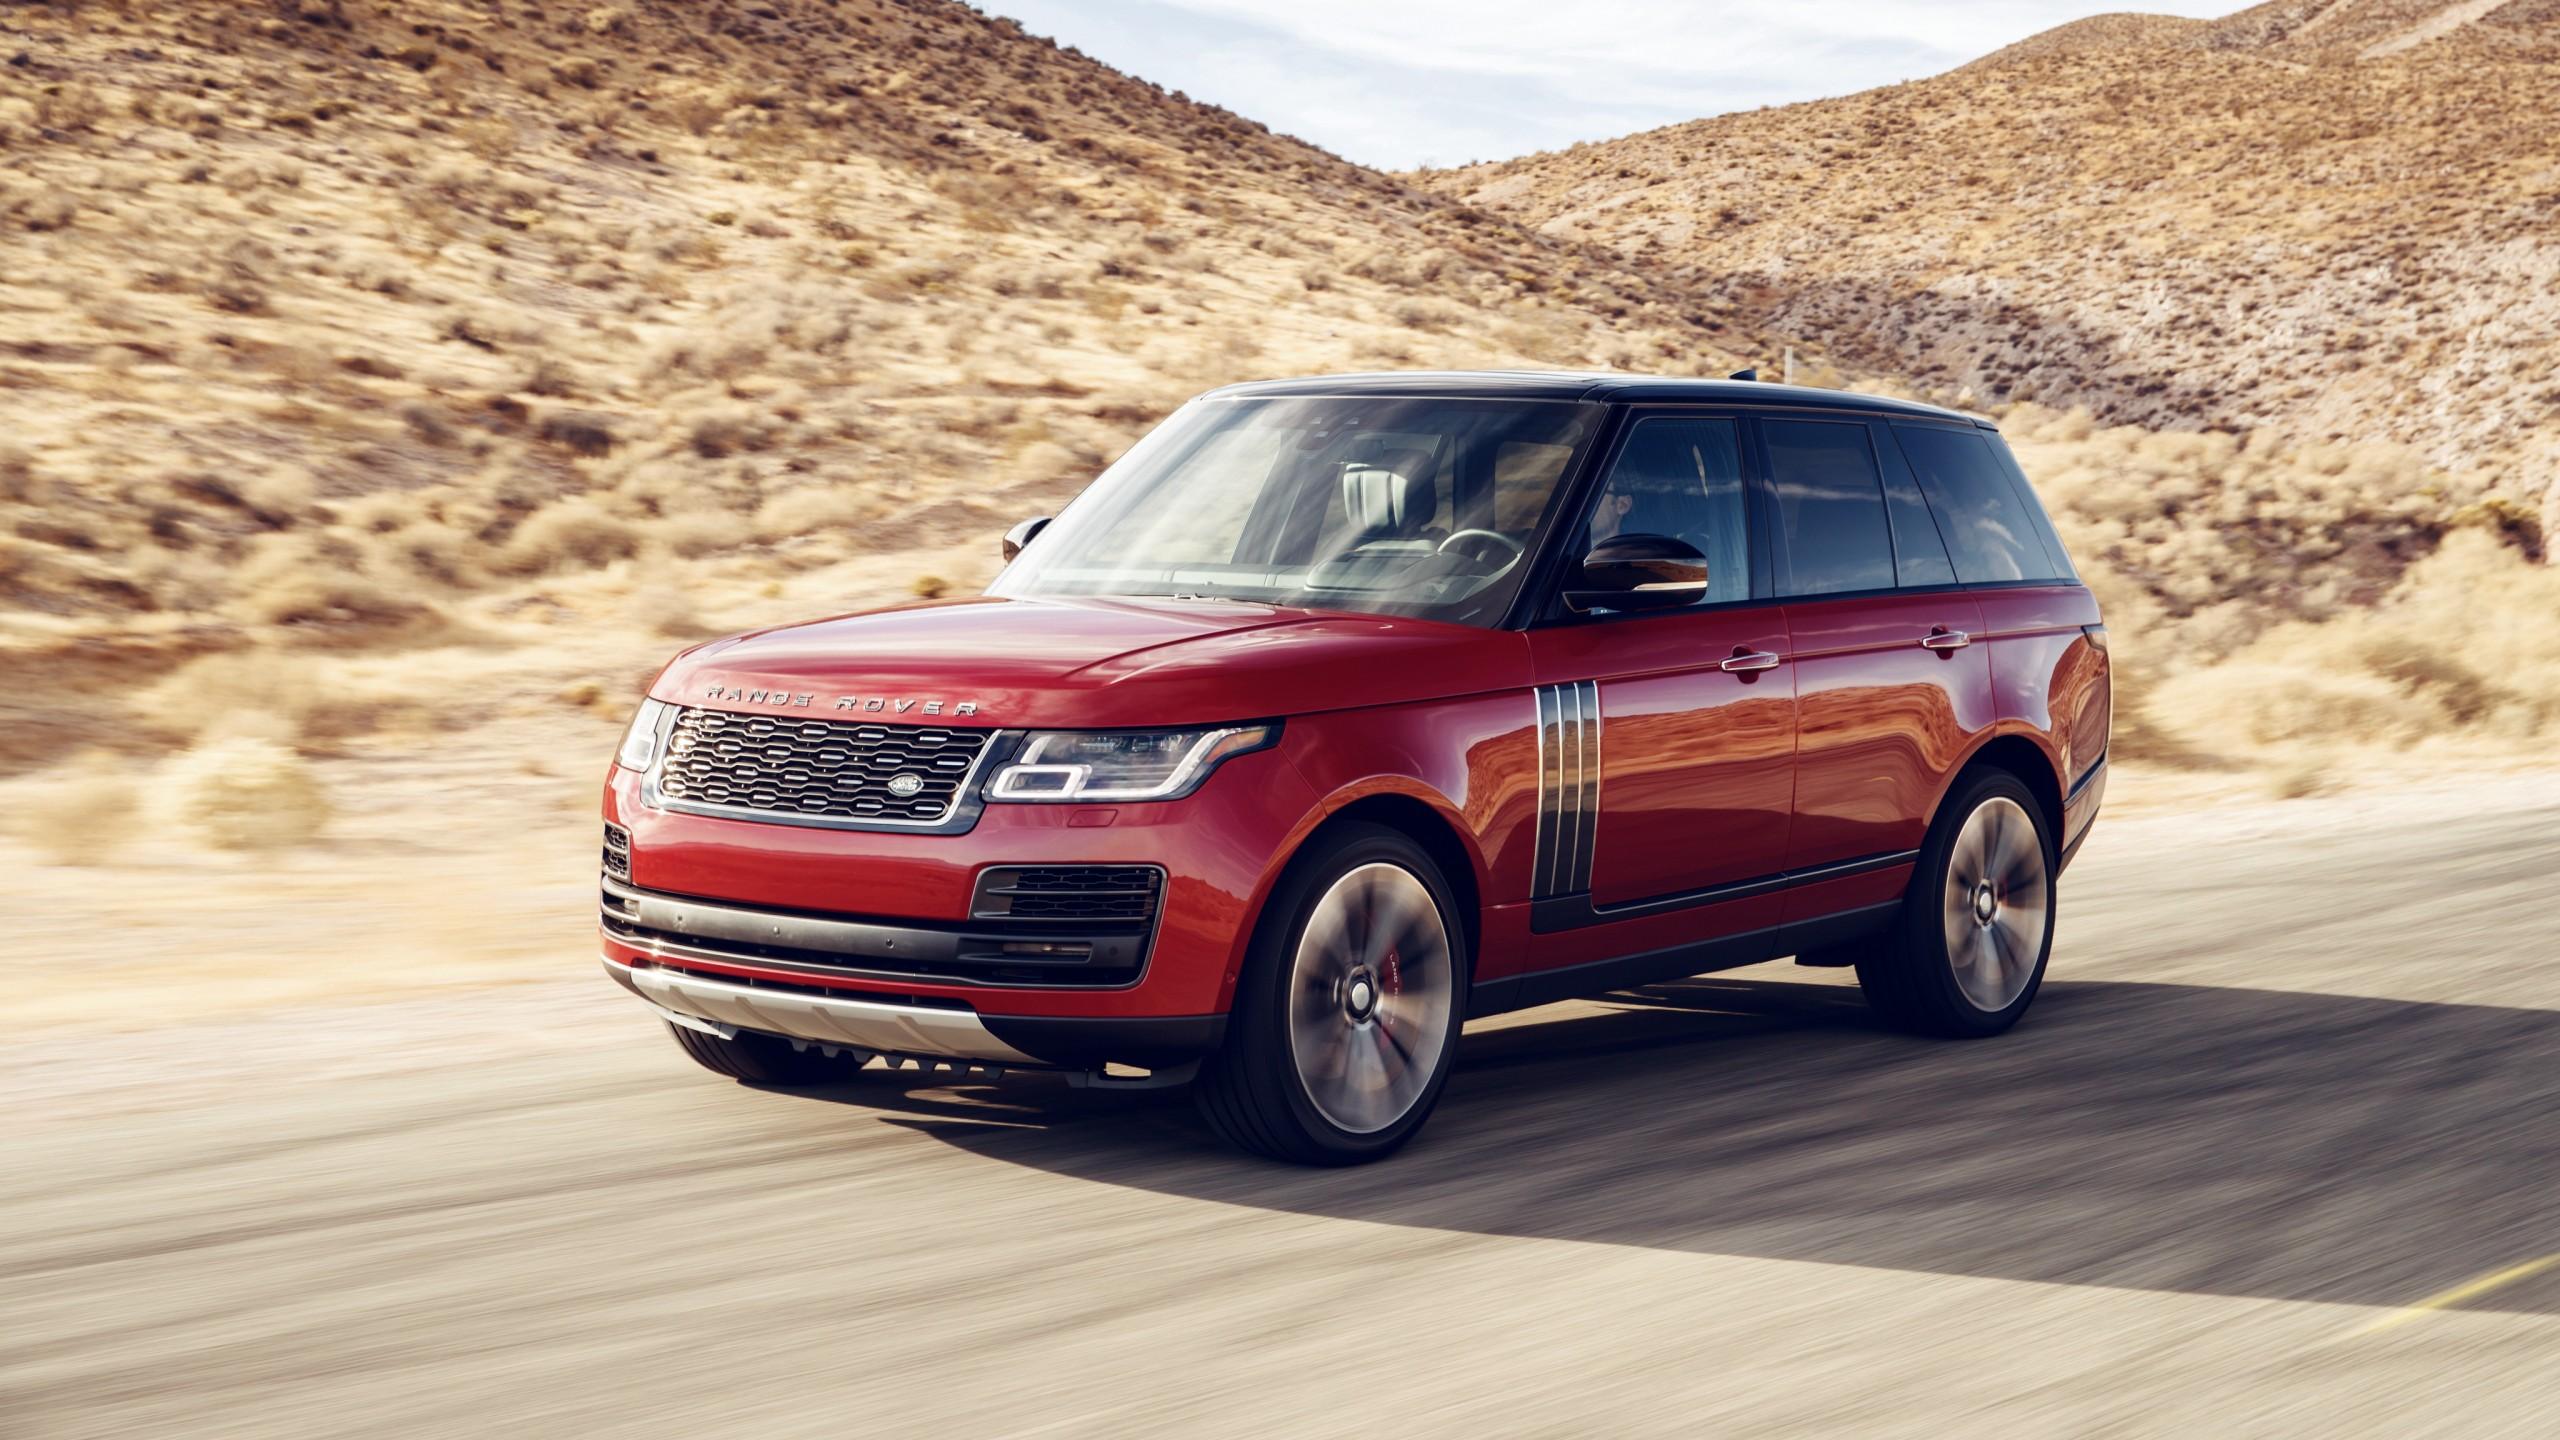 2018 Range Rover Svautobiography Dynamic 4k Wallpaper Hd